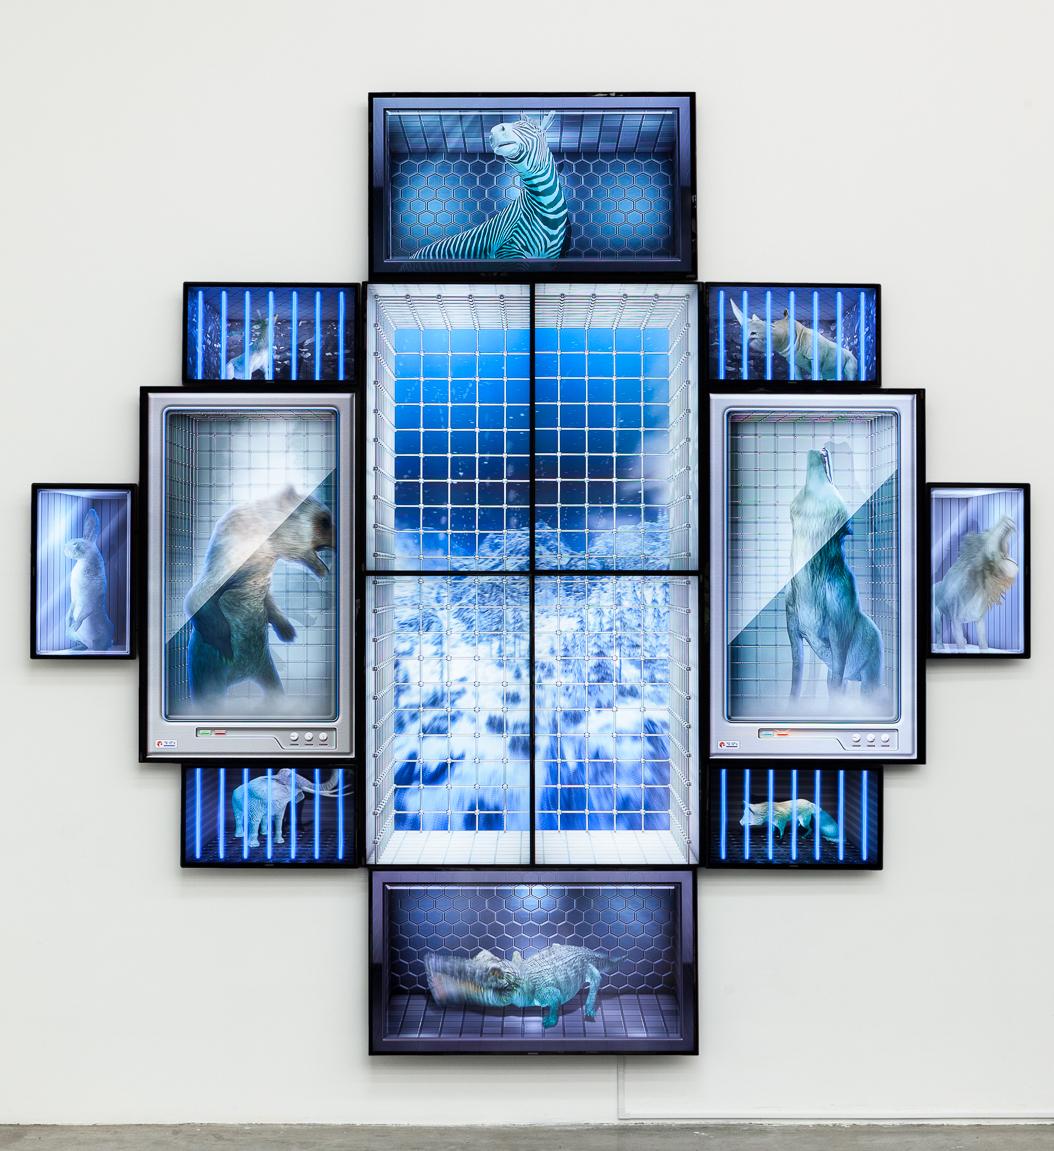 Image courtesy  Contemporary Art Daily